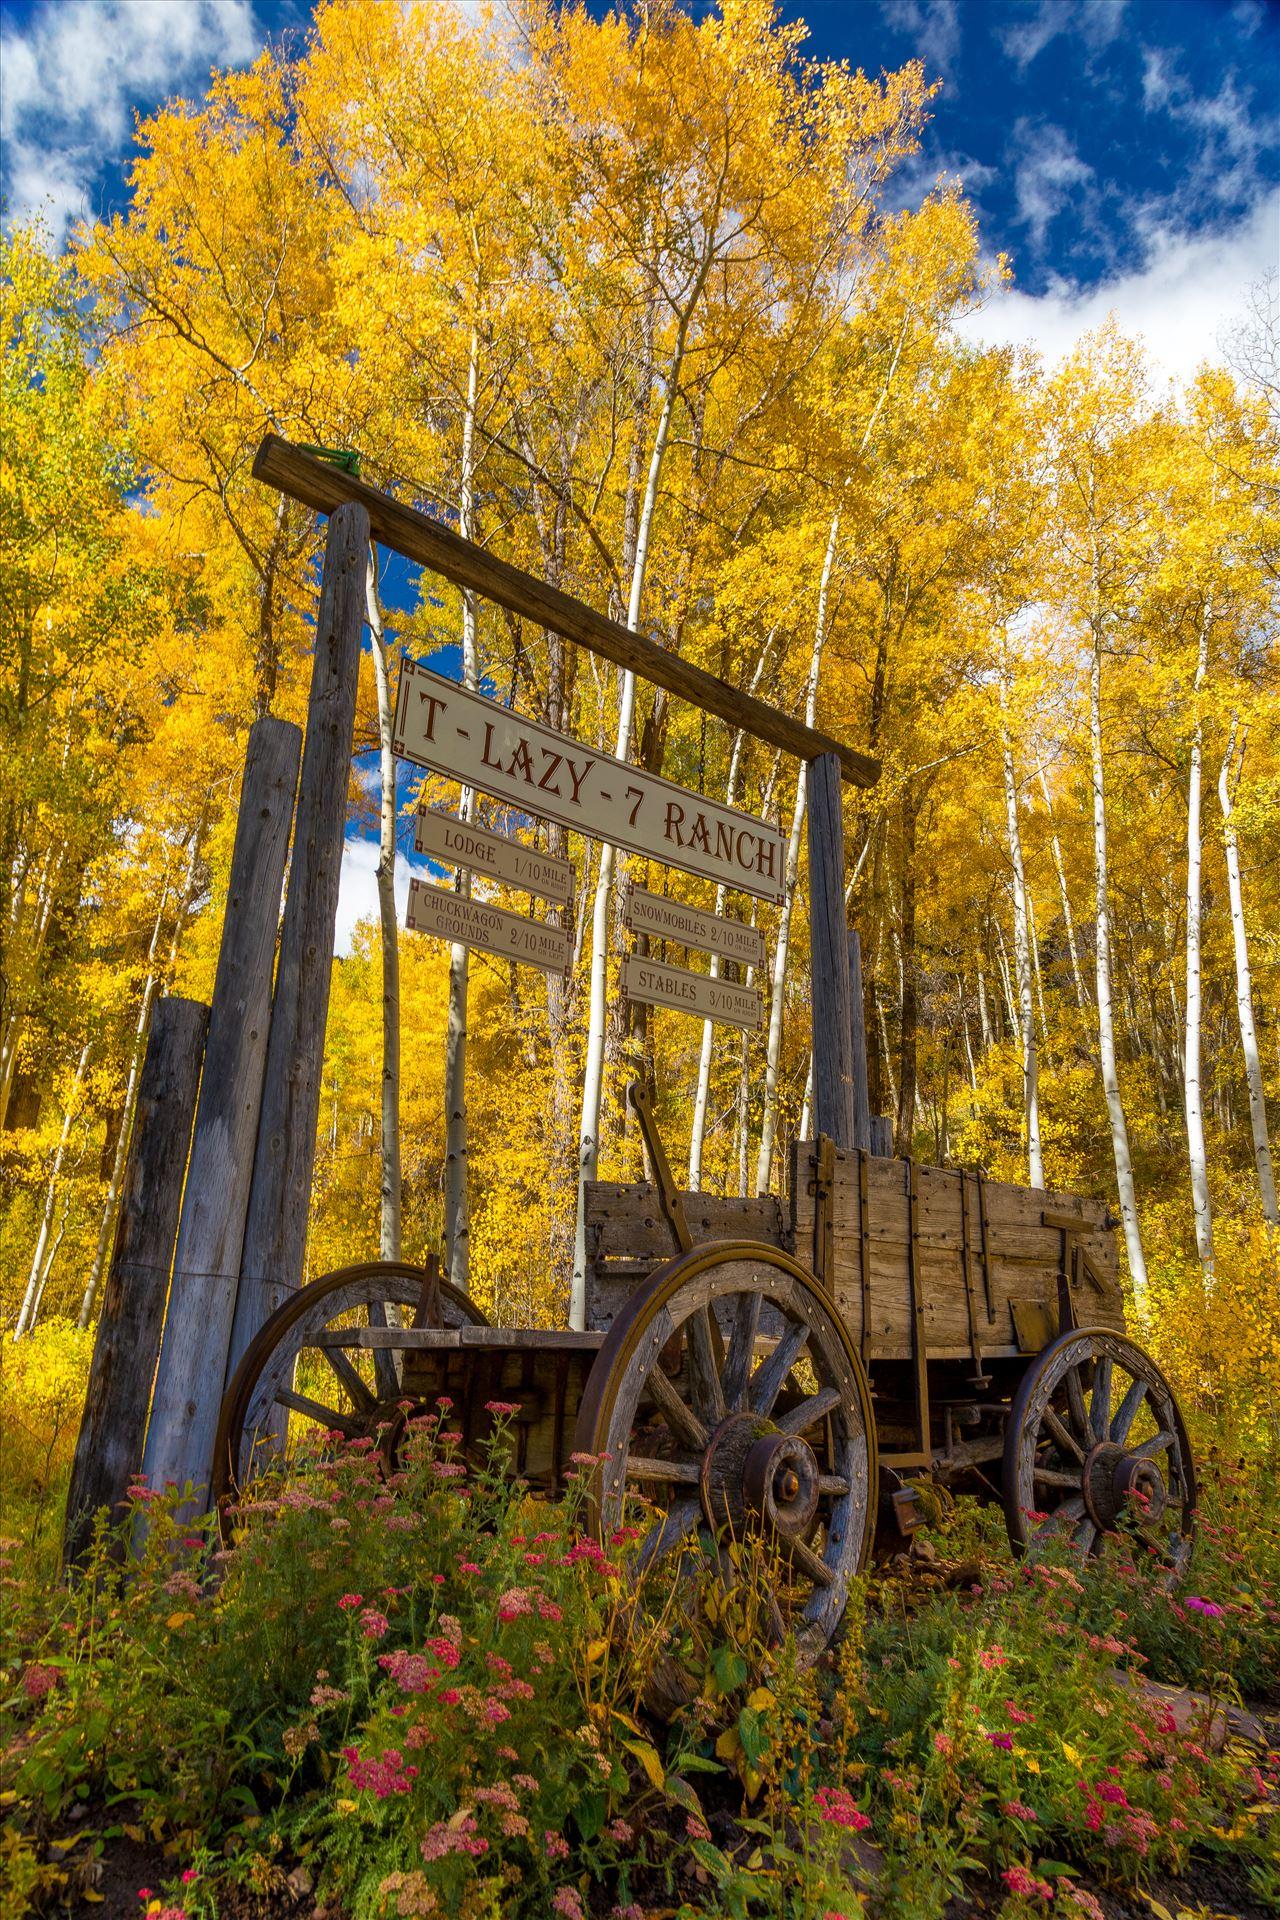 T-Lazy 7 Ranch - The T-Lazy 7 Ranch on Maroon Drive near Aspen, Colorado. by D Scott Smith